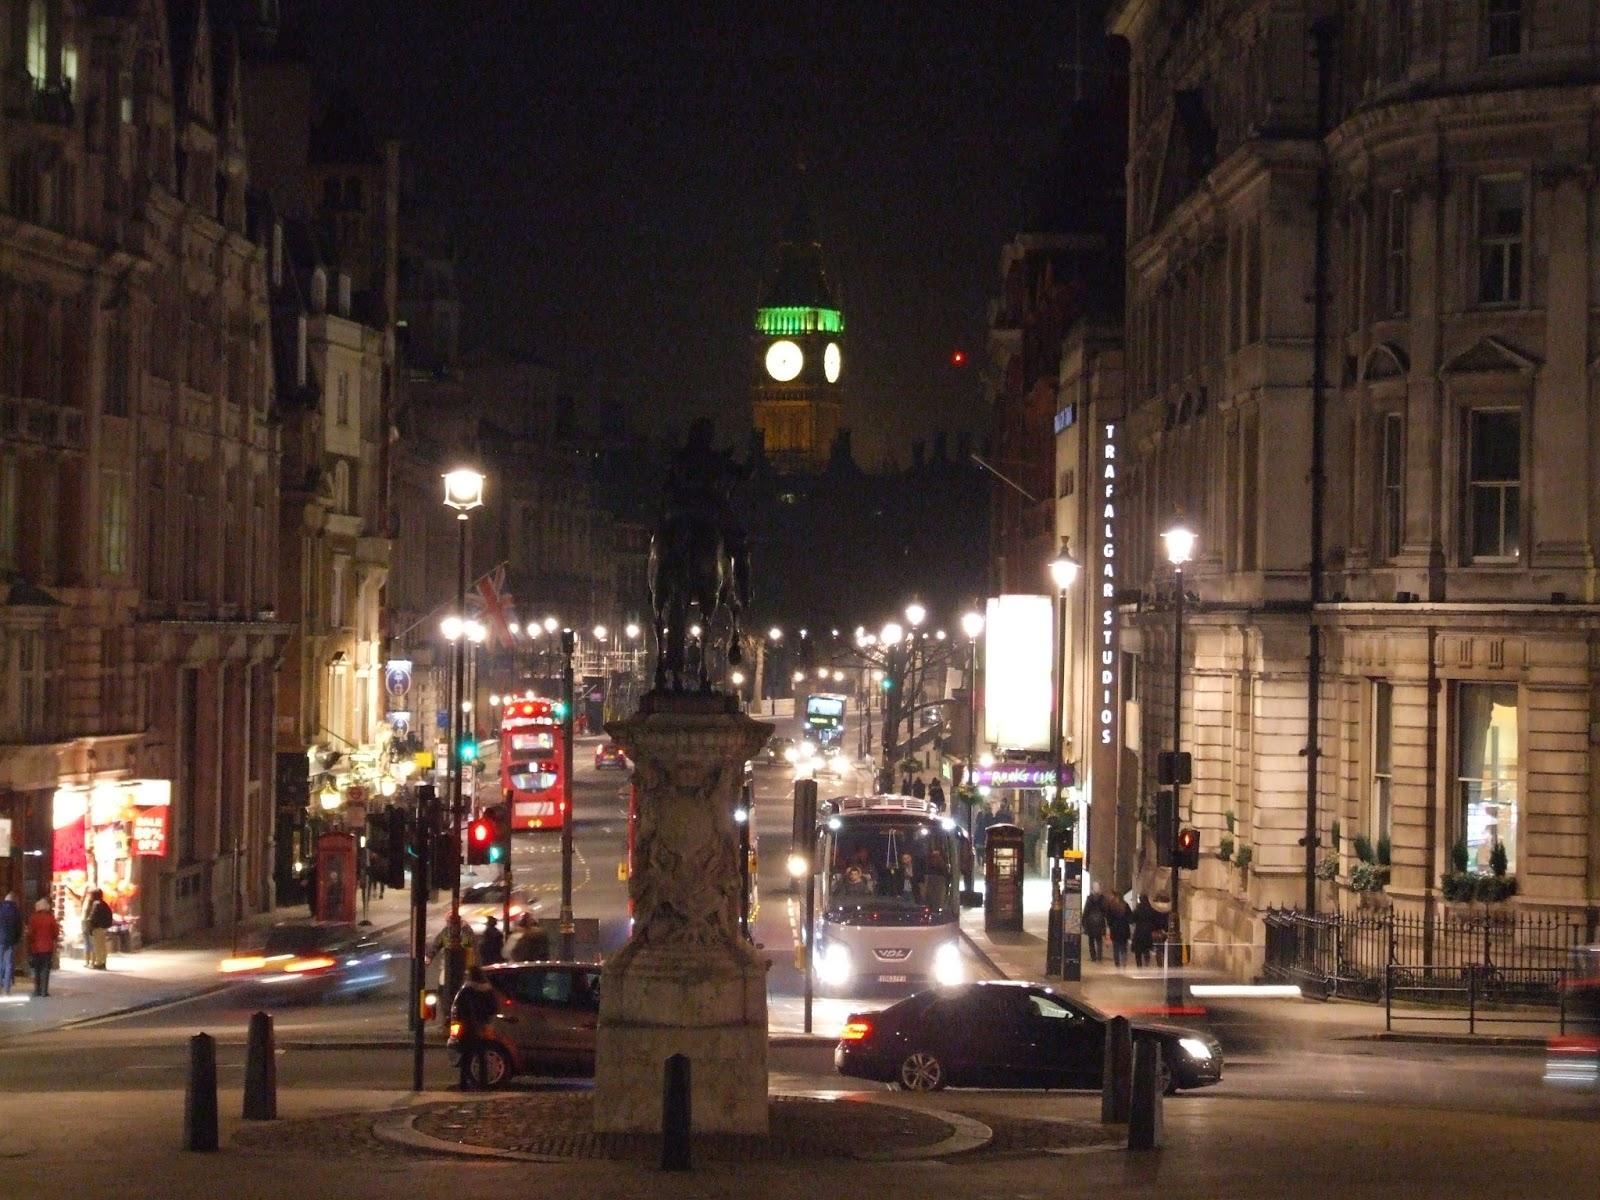 Widok na Big Bena z Trafalgar Square.